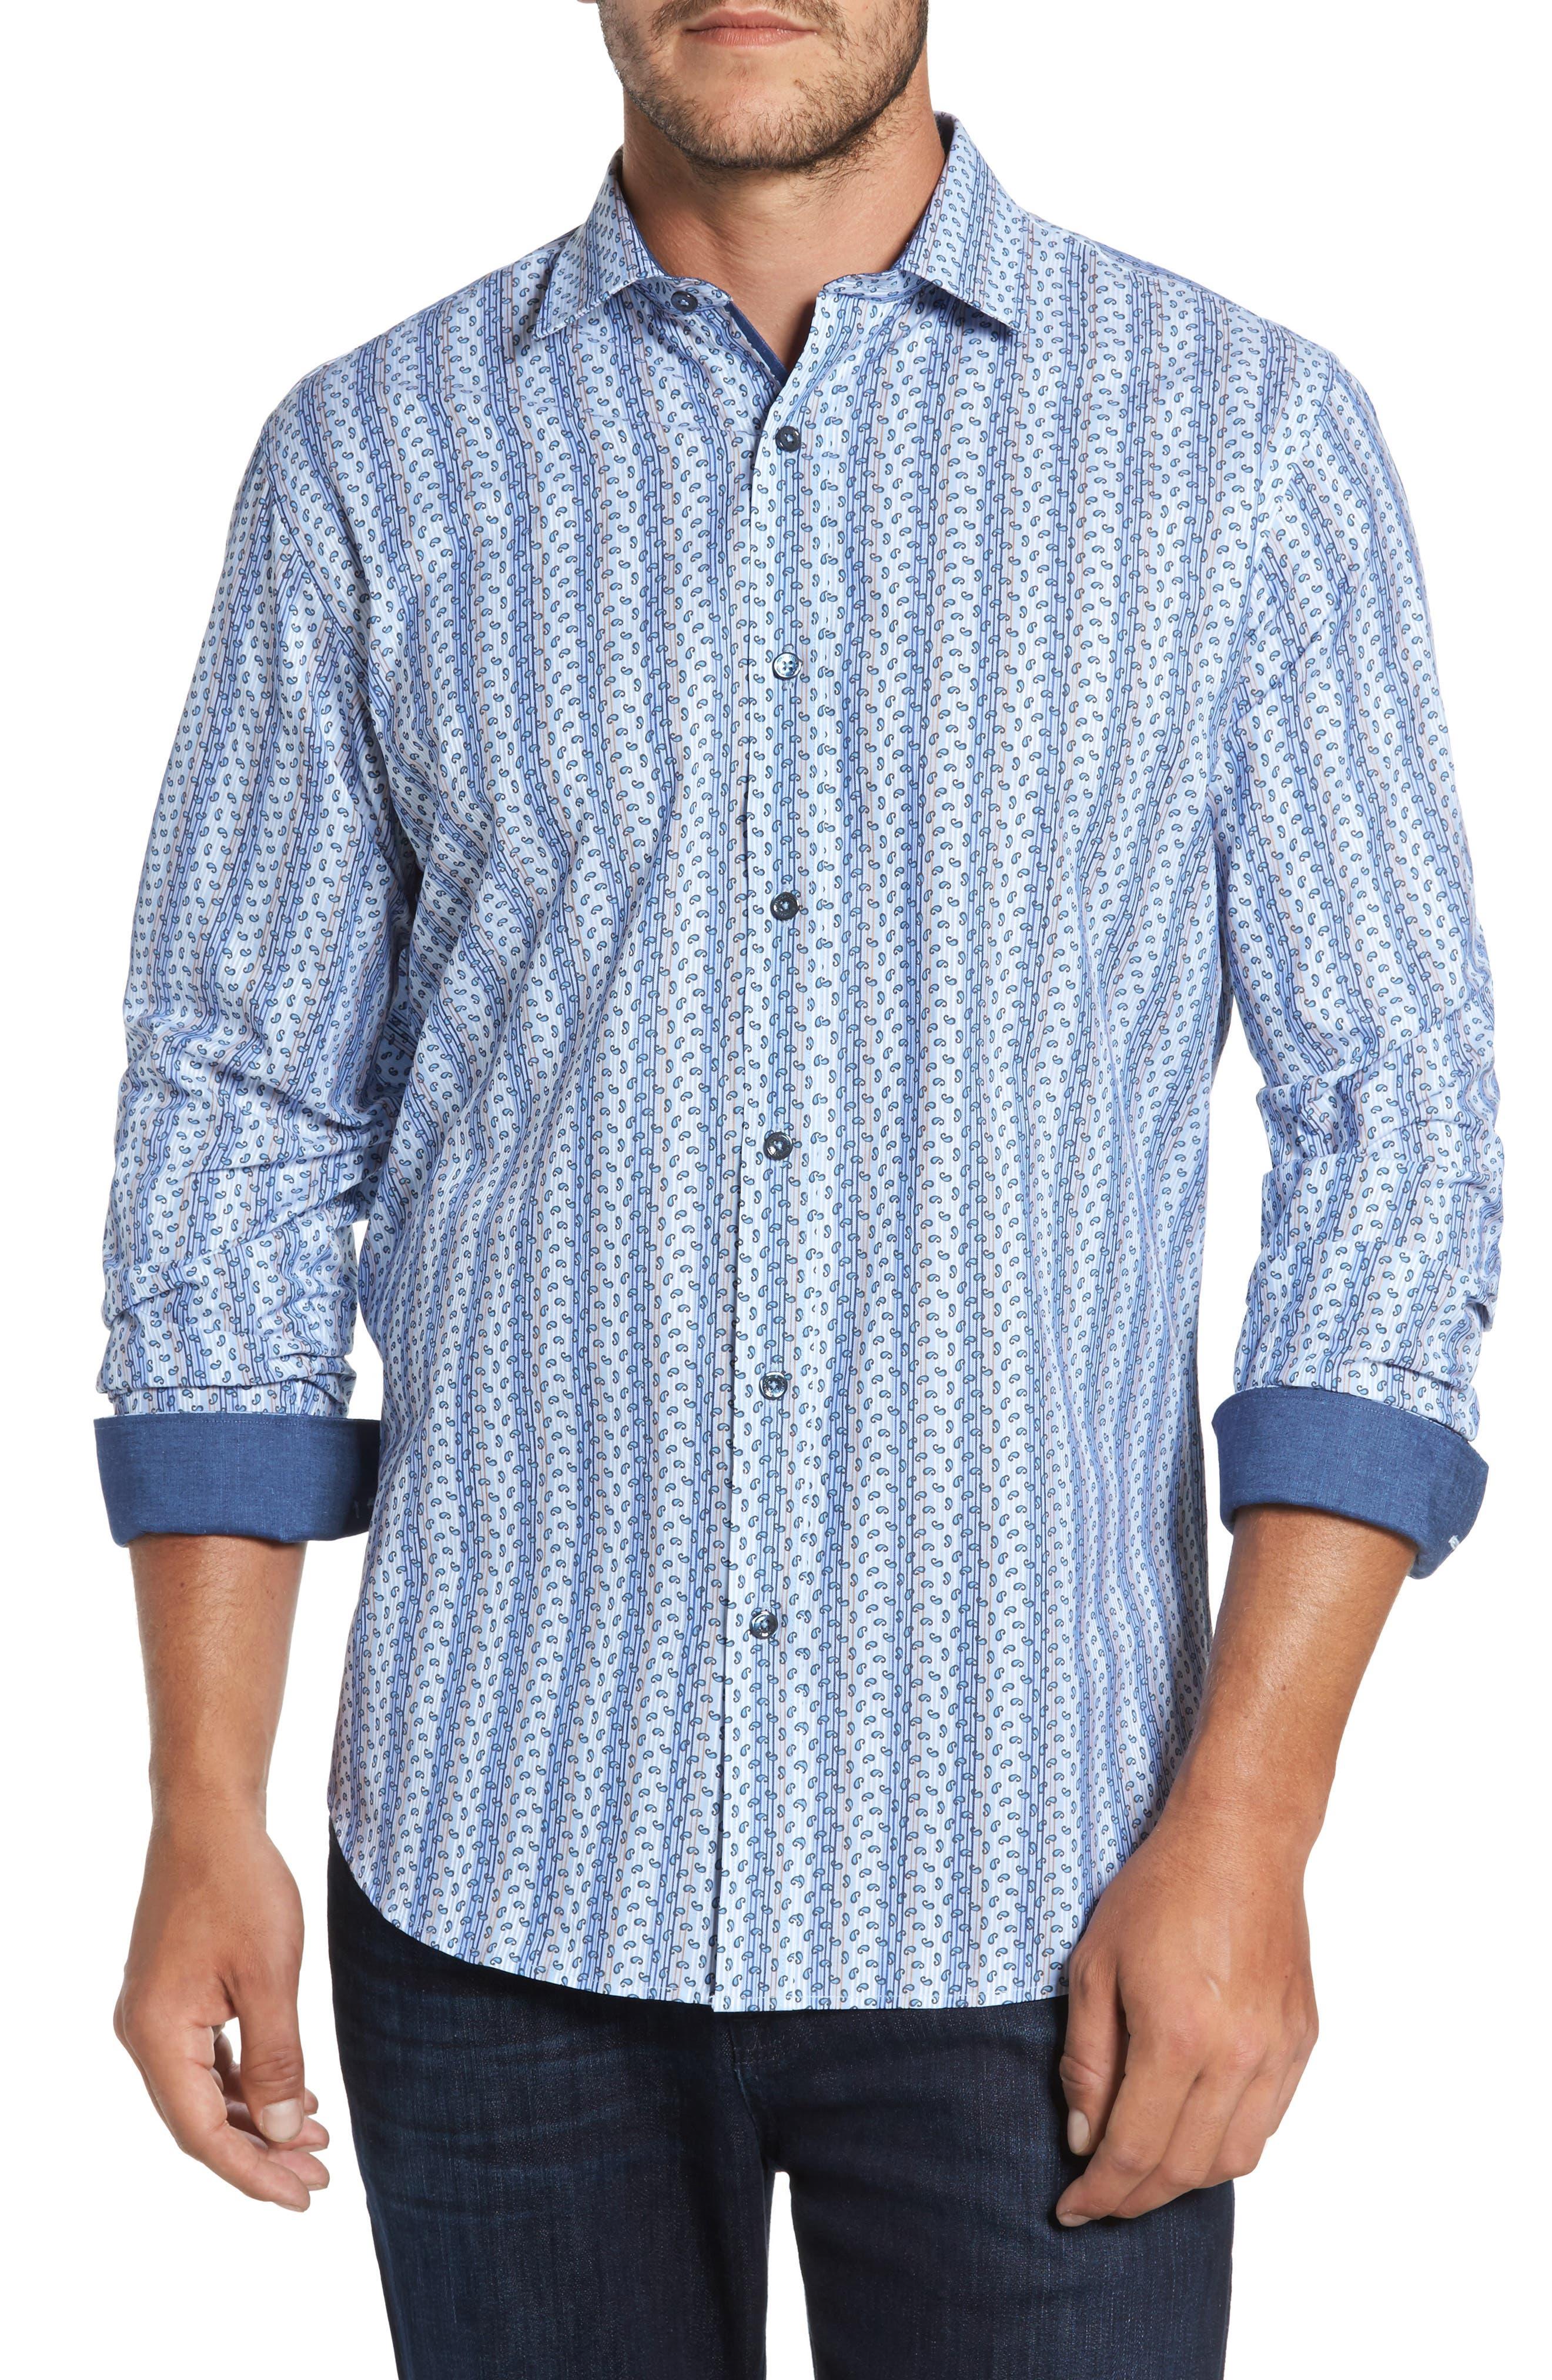 Main Image - Bugatchi Classic Fit Paisley Striped Sport Shirt